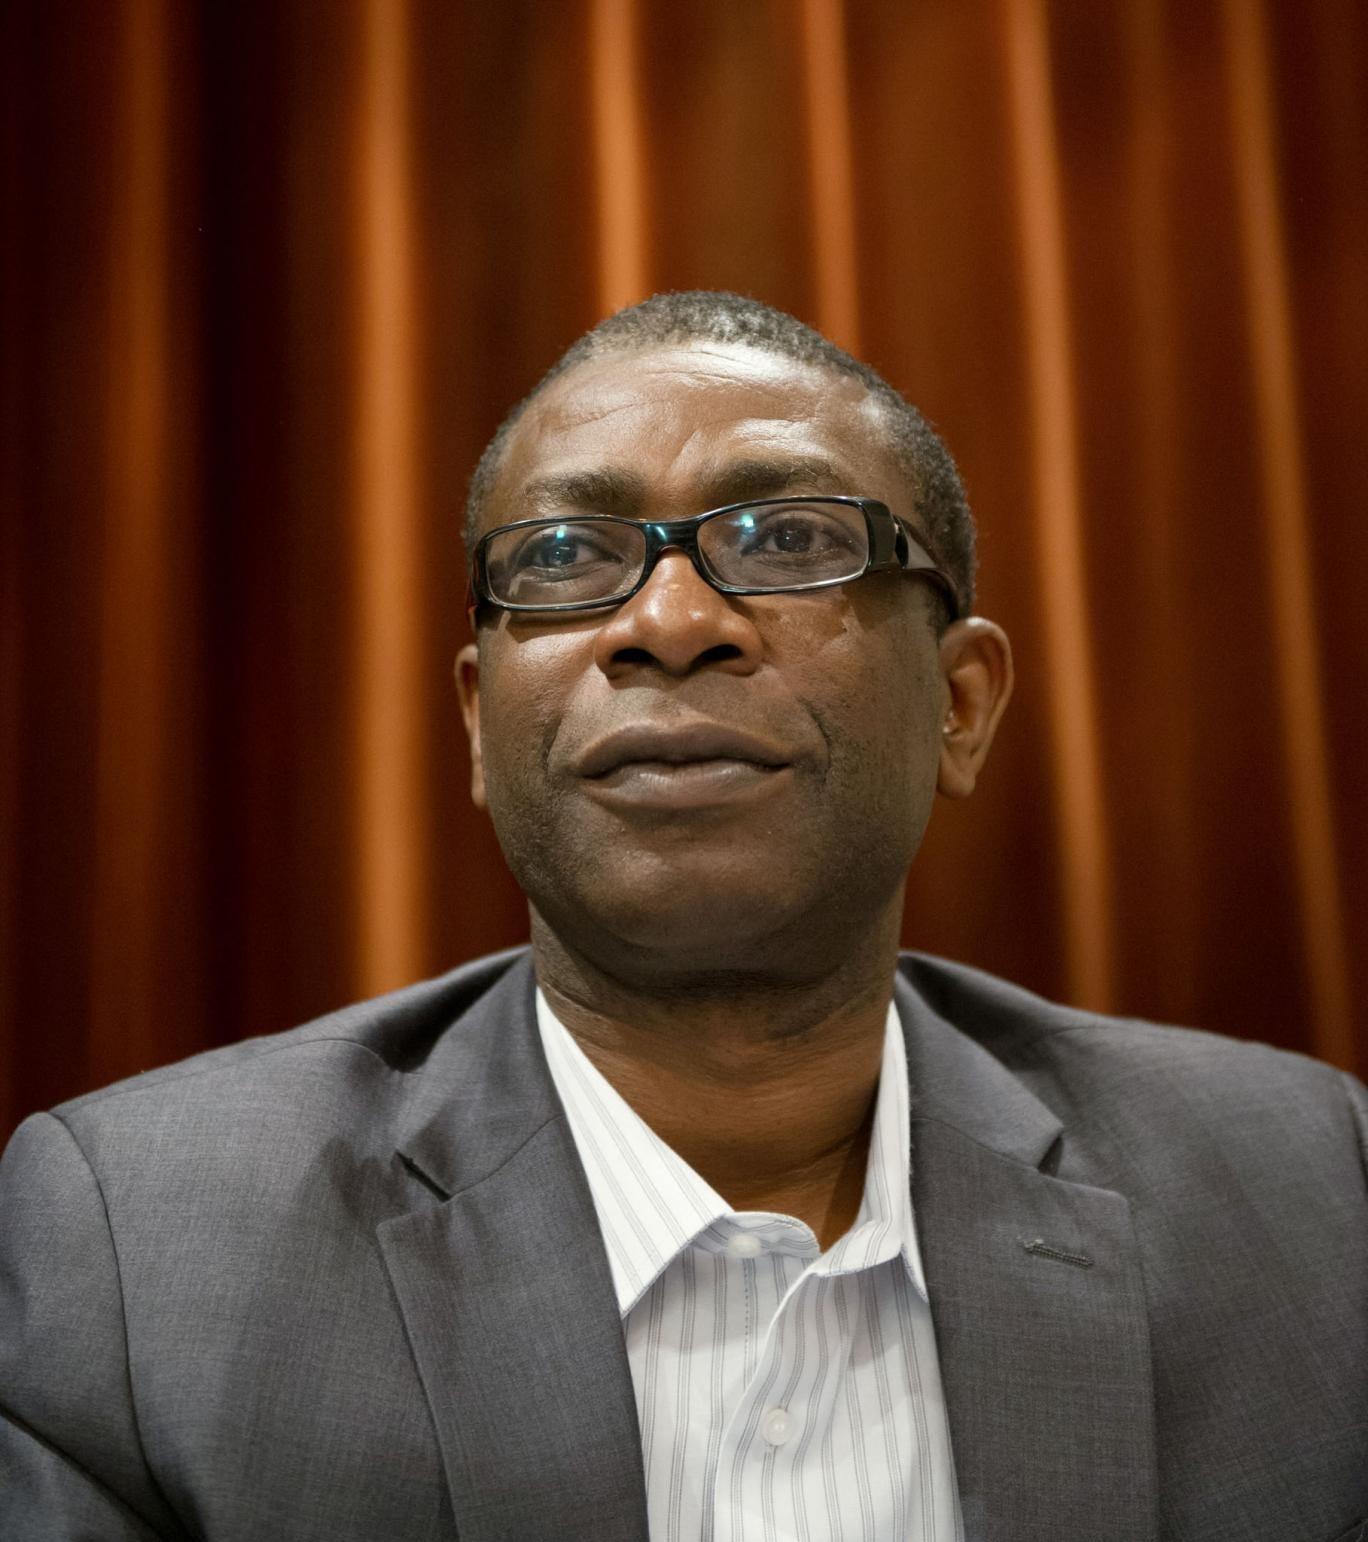 Senegalese singer Youssou Ndour has won the 2013 Polar Music Prize